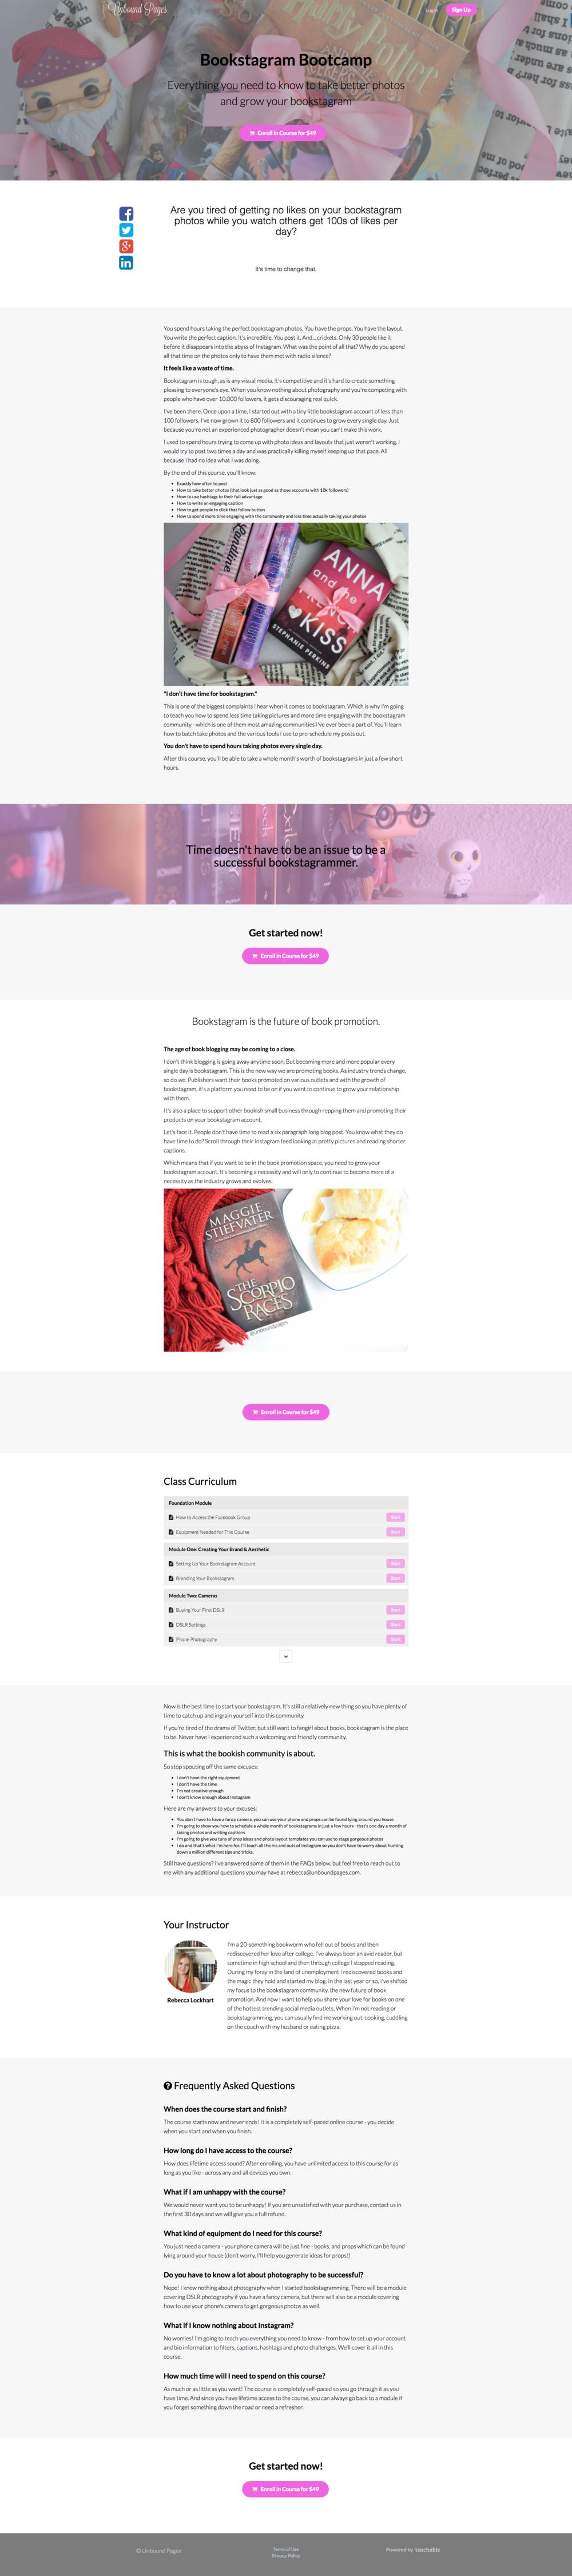 """Bookstagram Bootcamp"" by Rebecca Lockhart"